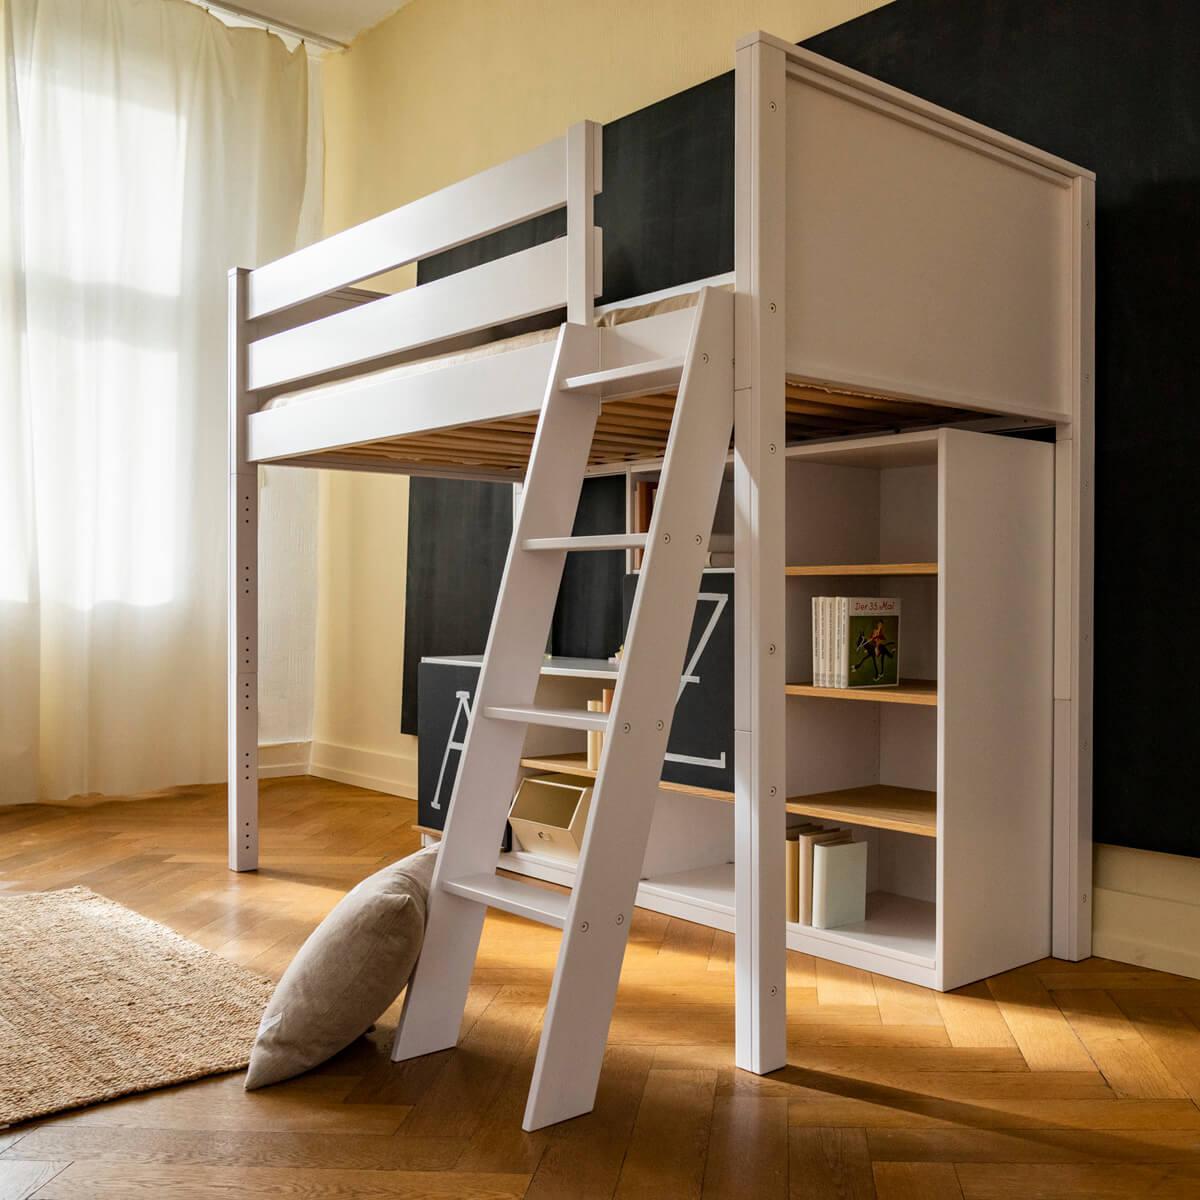 Halbhohes Bett-Regal KASVA Debreuyn Buche massiv weiß-lackiert